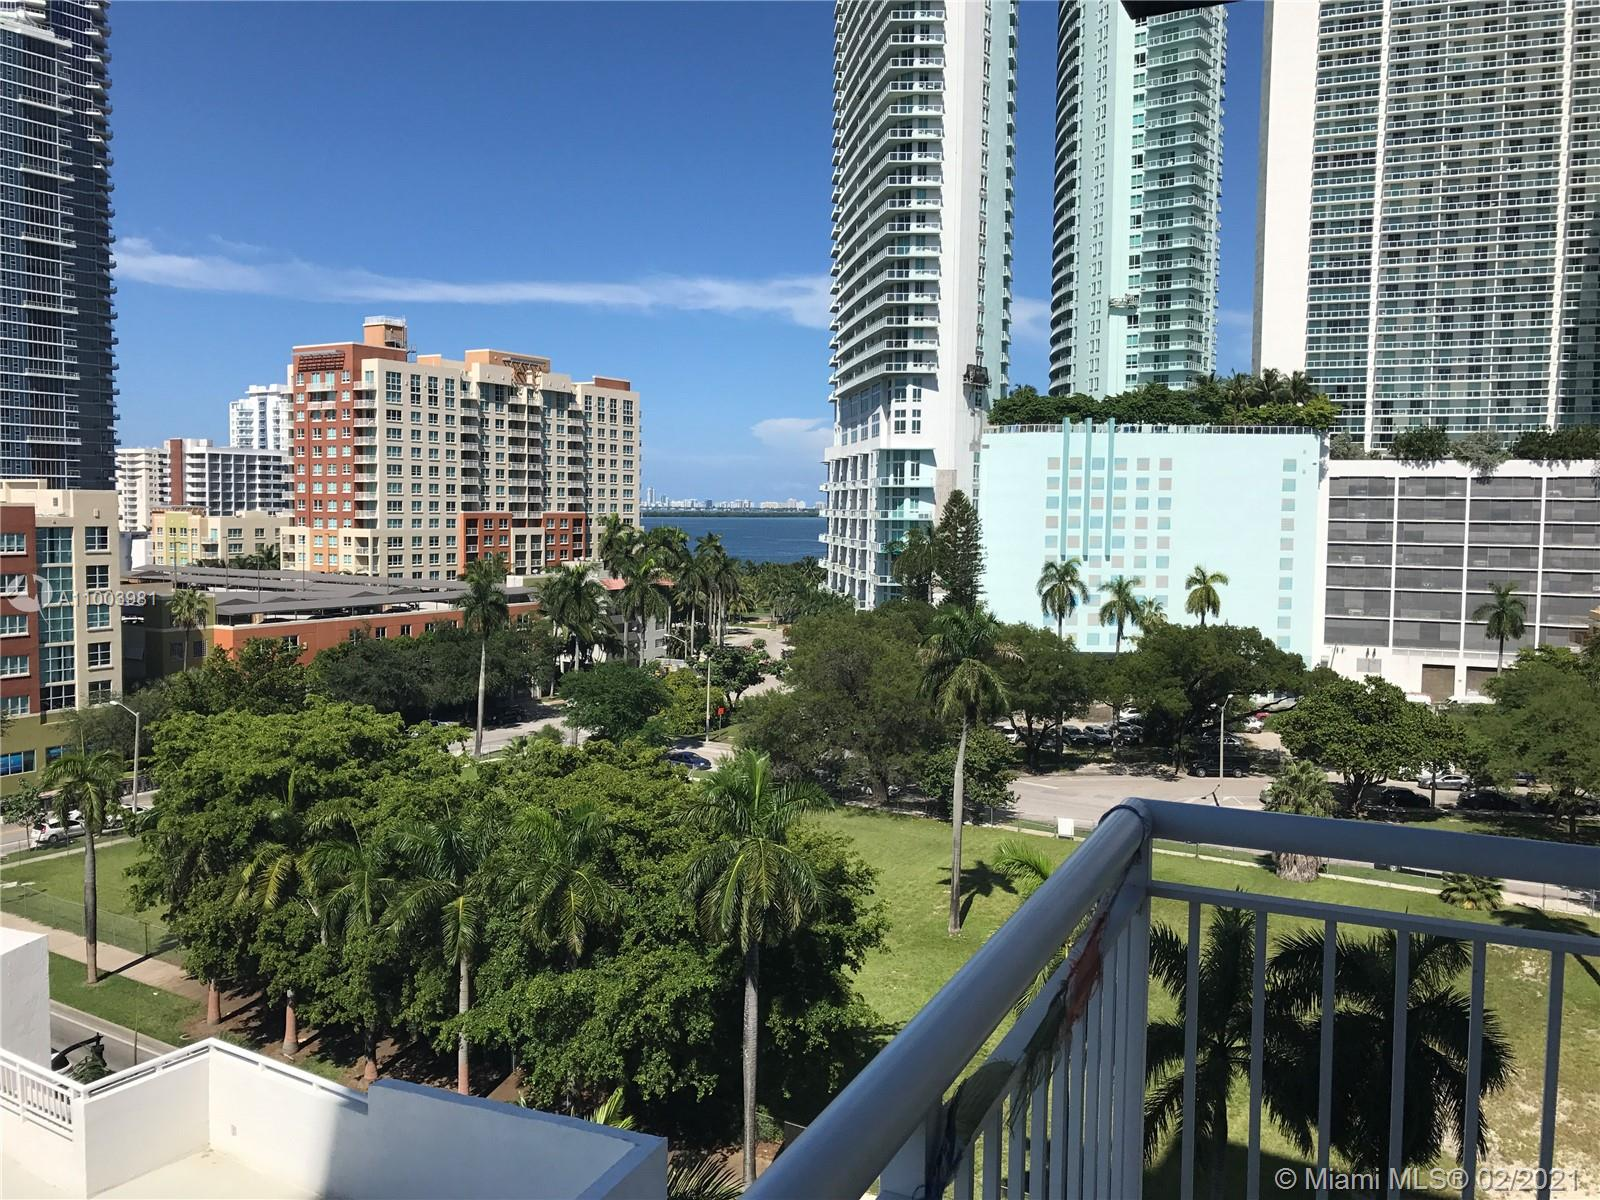 1800 Biscayne Plaza #808 - 275 NE 18th St #808, Miami, FL 33132